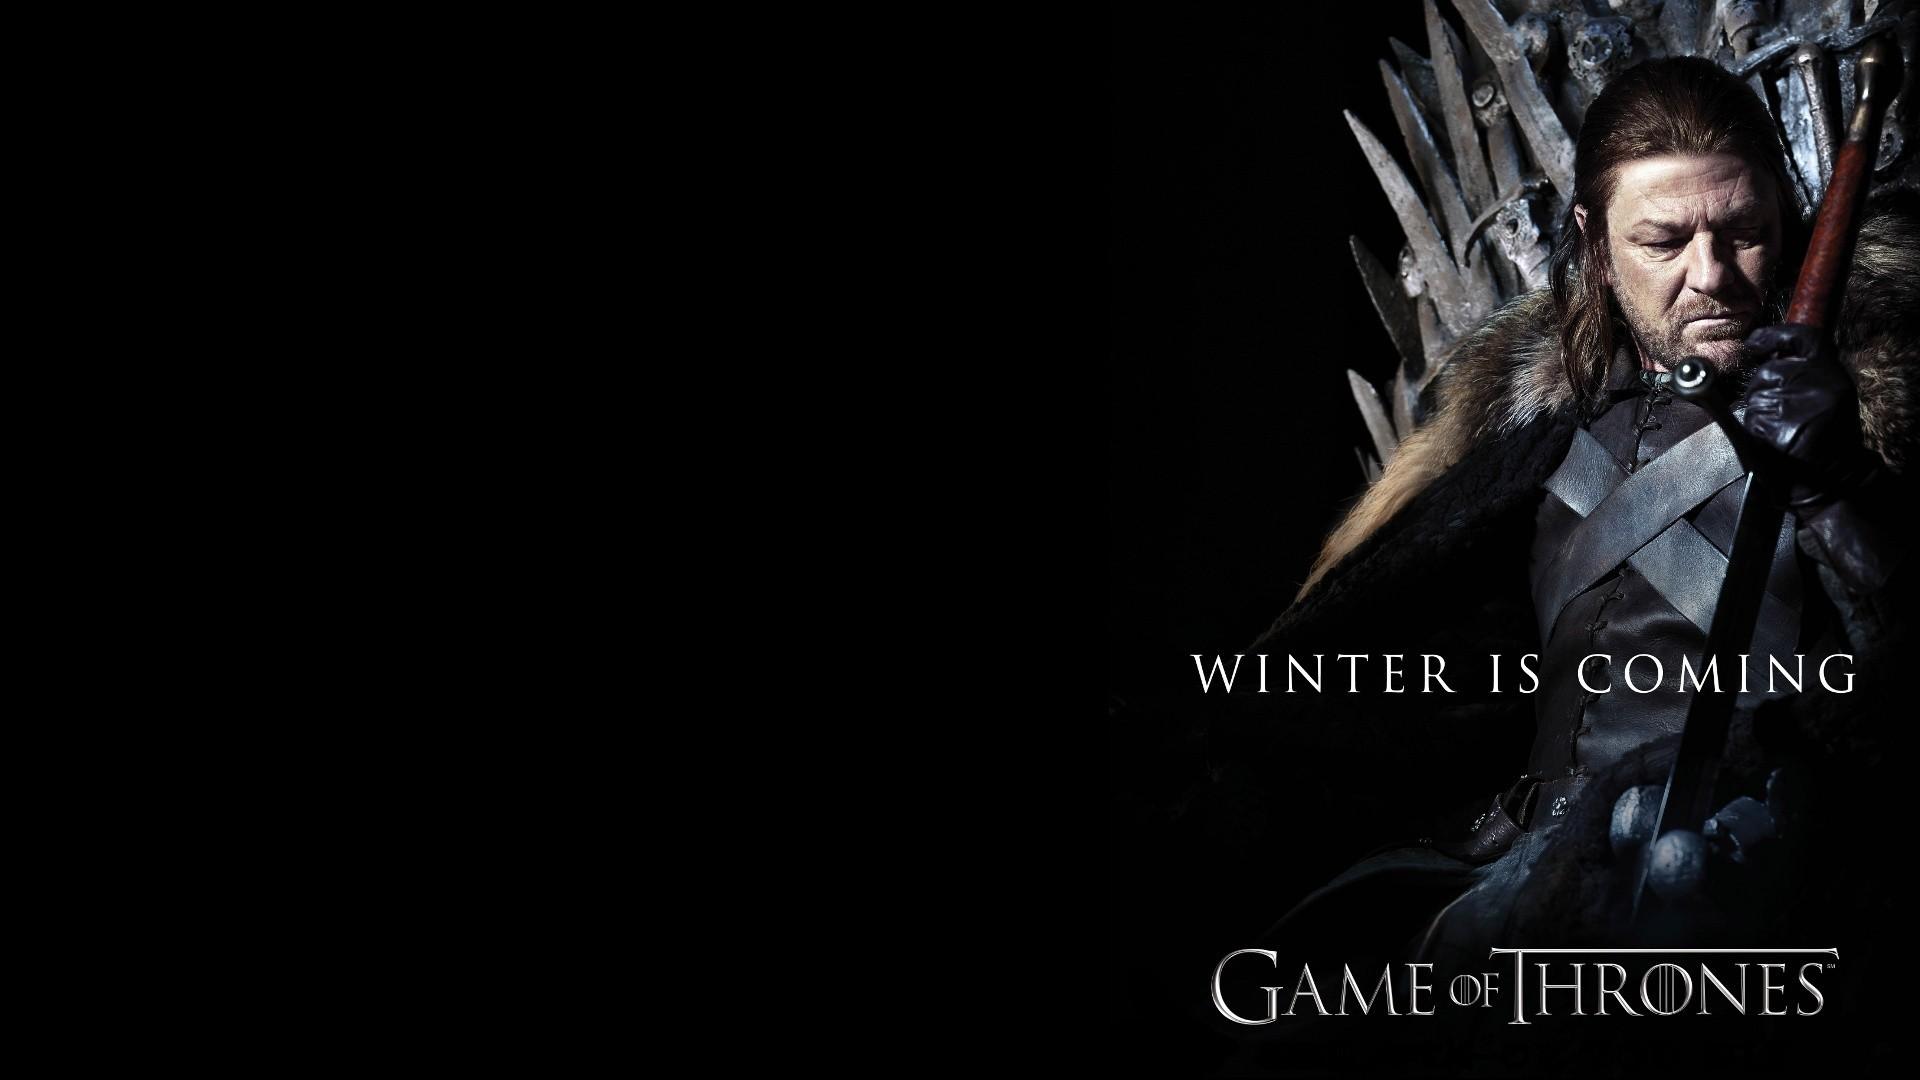 Game Of Thrones Winter Is Coming Ned Stark Sean Bean Darkness Screenshot 1920x1080 Px Computer Wallpaper